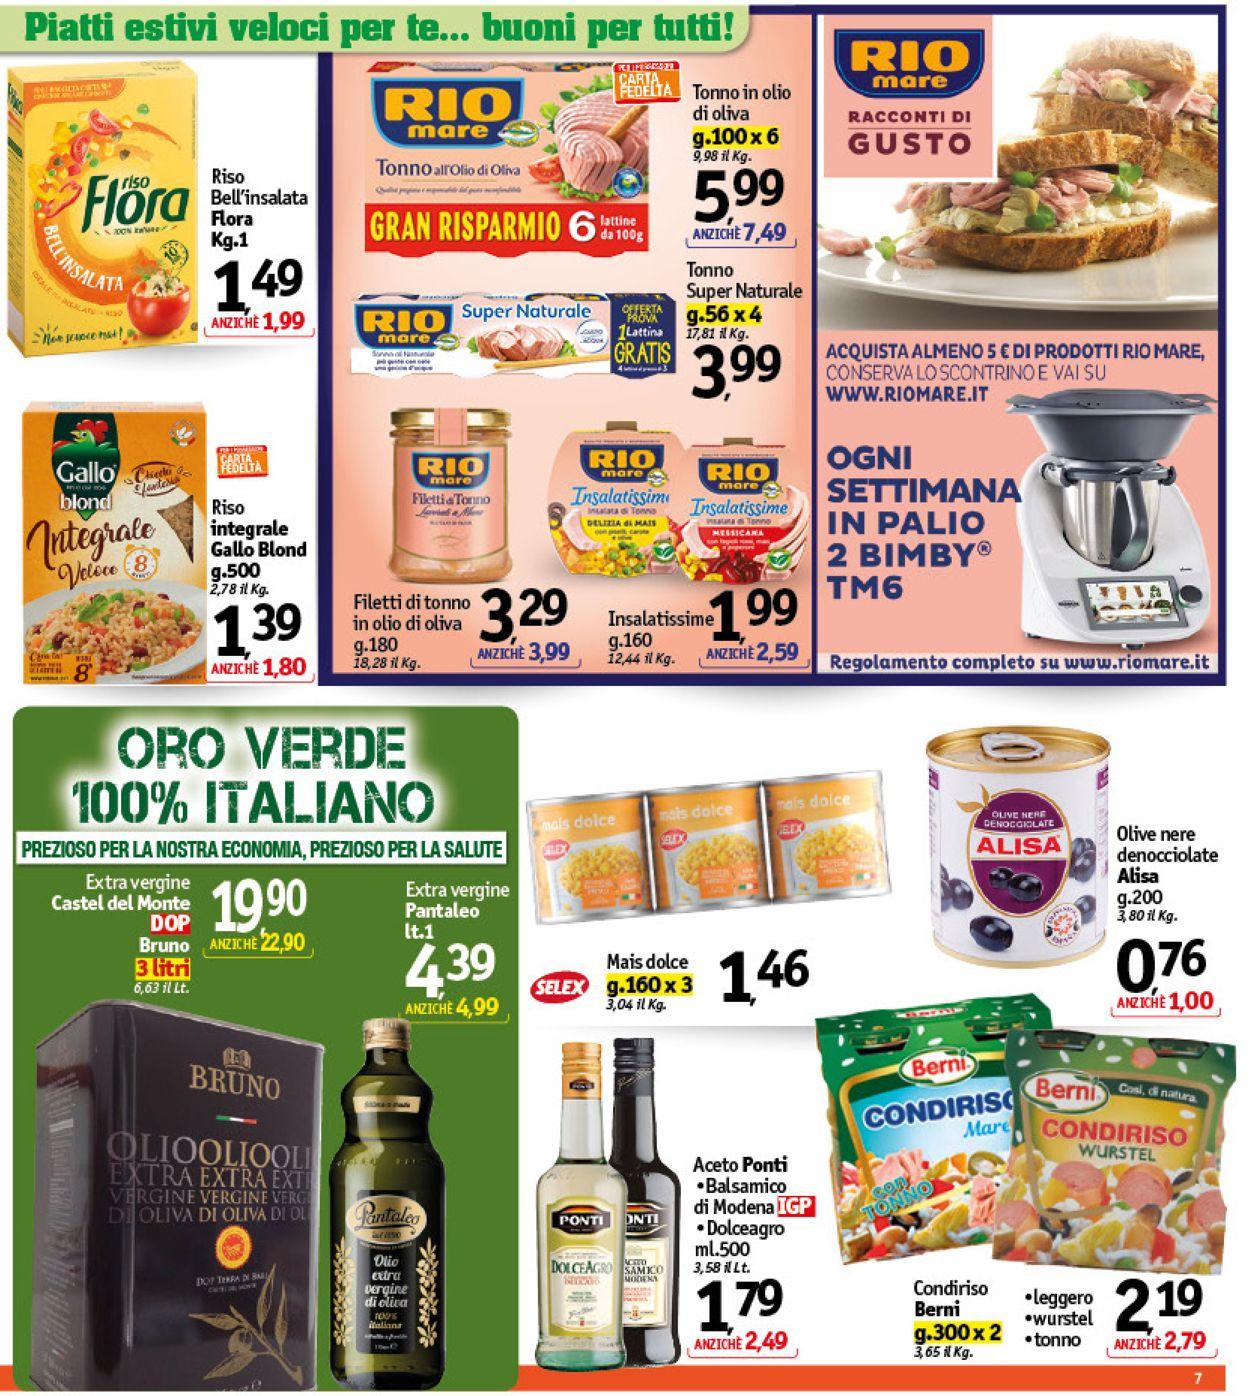 Volantino Famila - Offerte 29/07-07/08/2021 (Pagina 7)